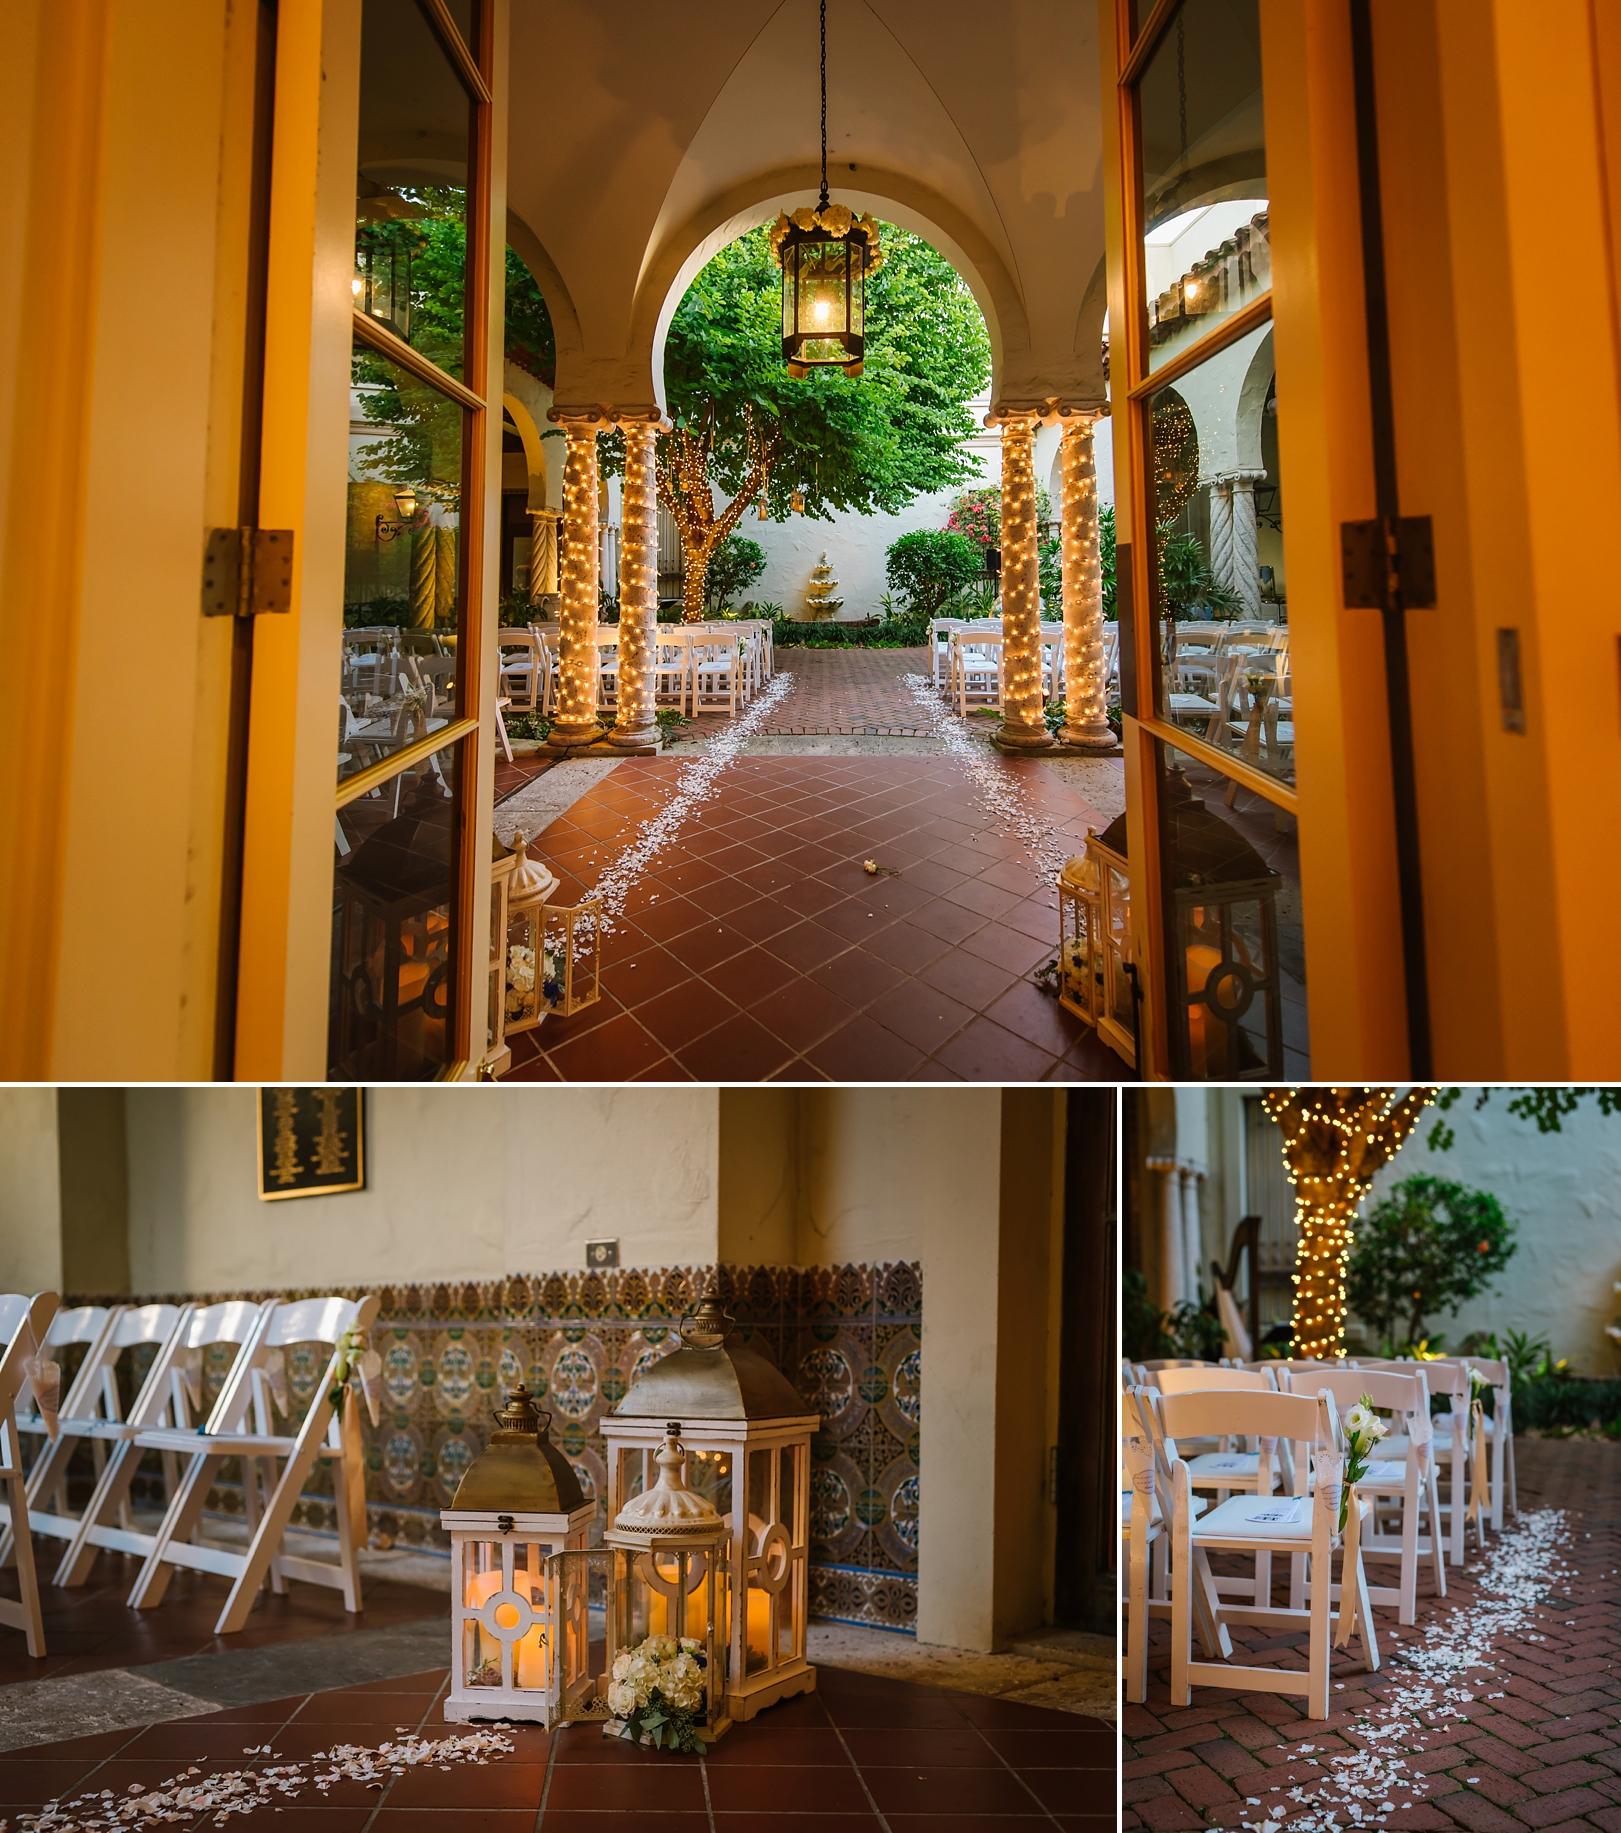 st-pete-art-museum-wedding-vinoy-ashlee-hamon-photography_0012.jpg